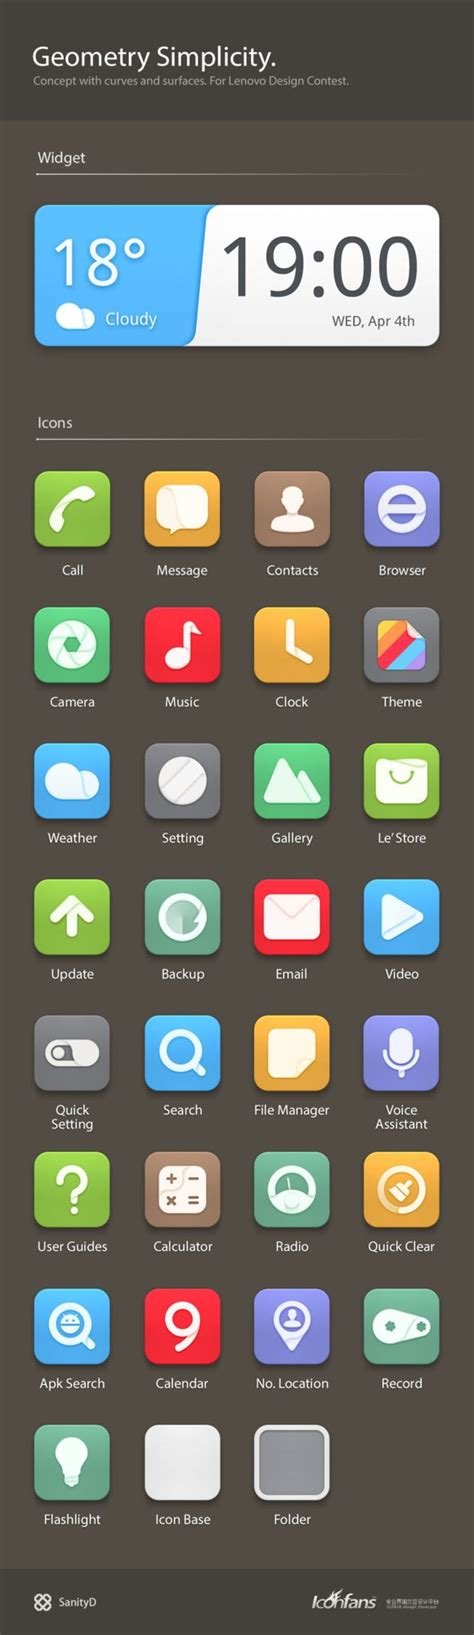 designspiration android 联想手机主题设计 geometry si ヅ游客帝国小ccミ采集到app 183 系列图标 338图 花瓣ui